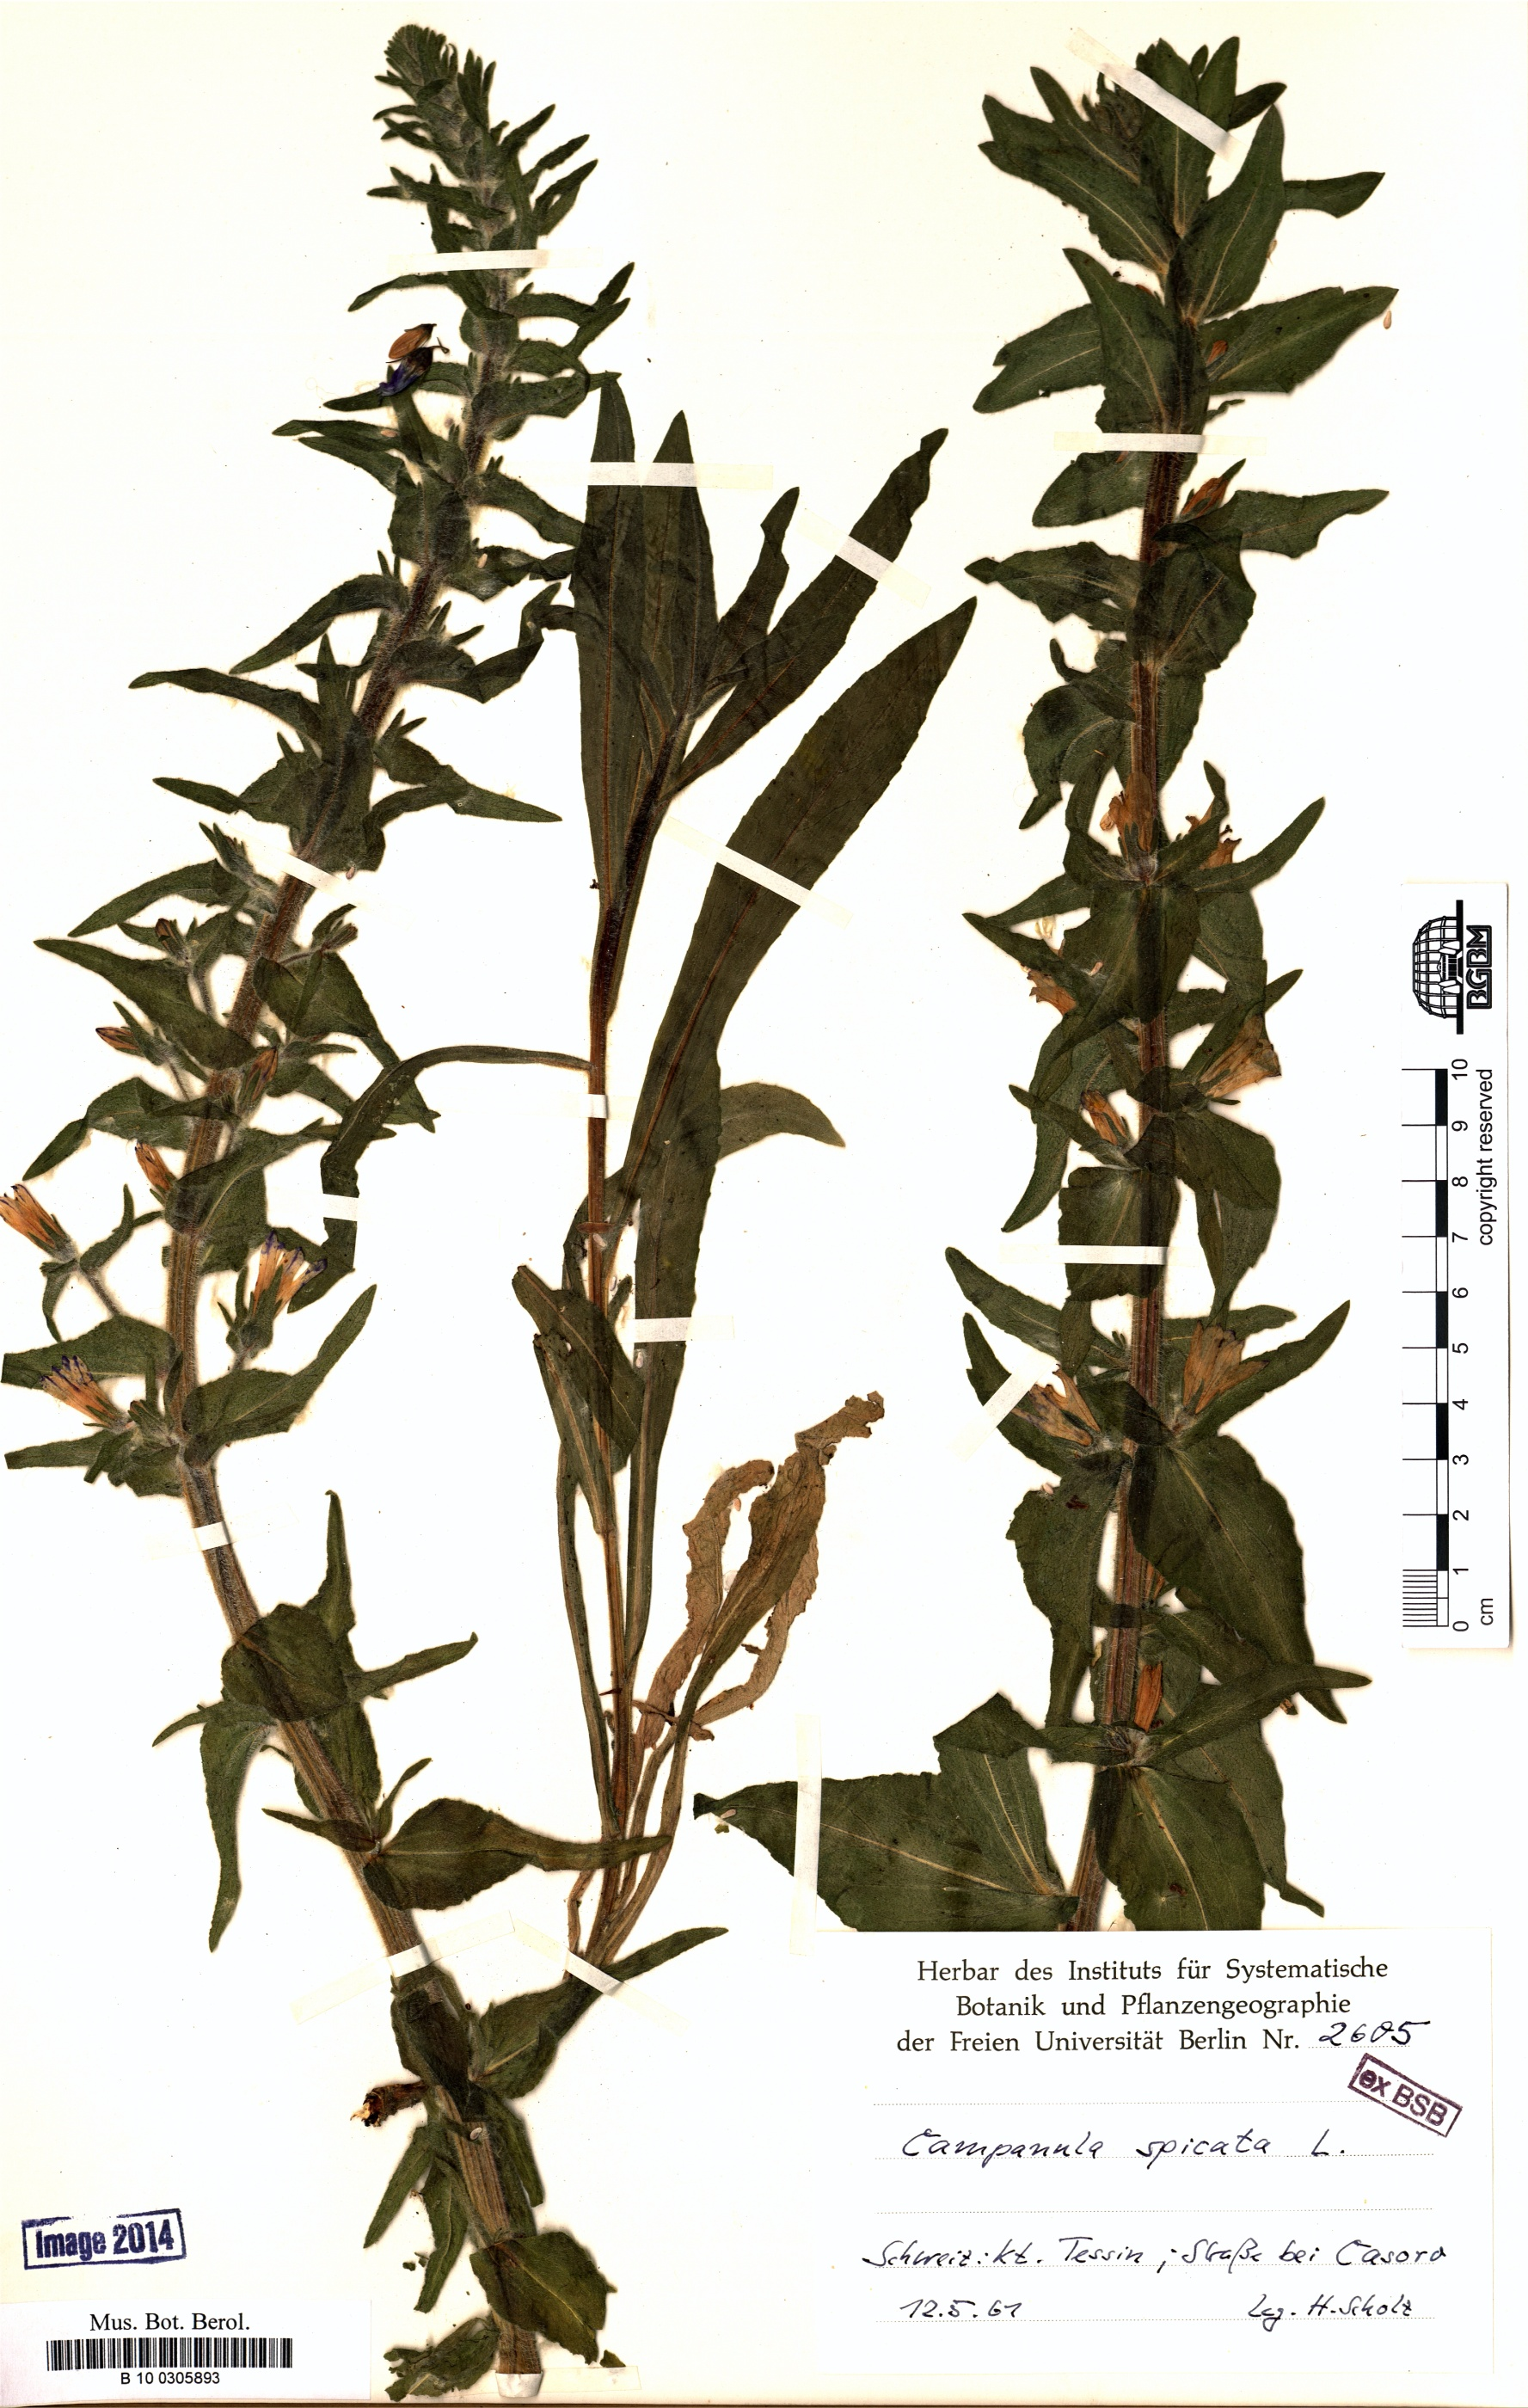 http://ww2.bgbm.org/herbarium/images/B/10/03/05/89/B_10_0305893.jpg